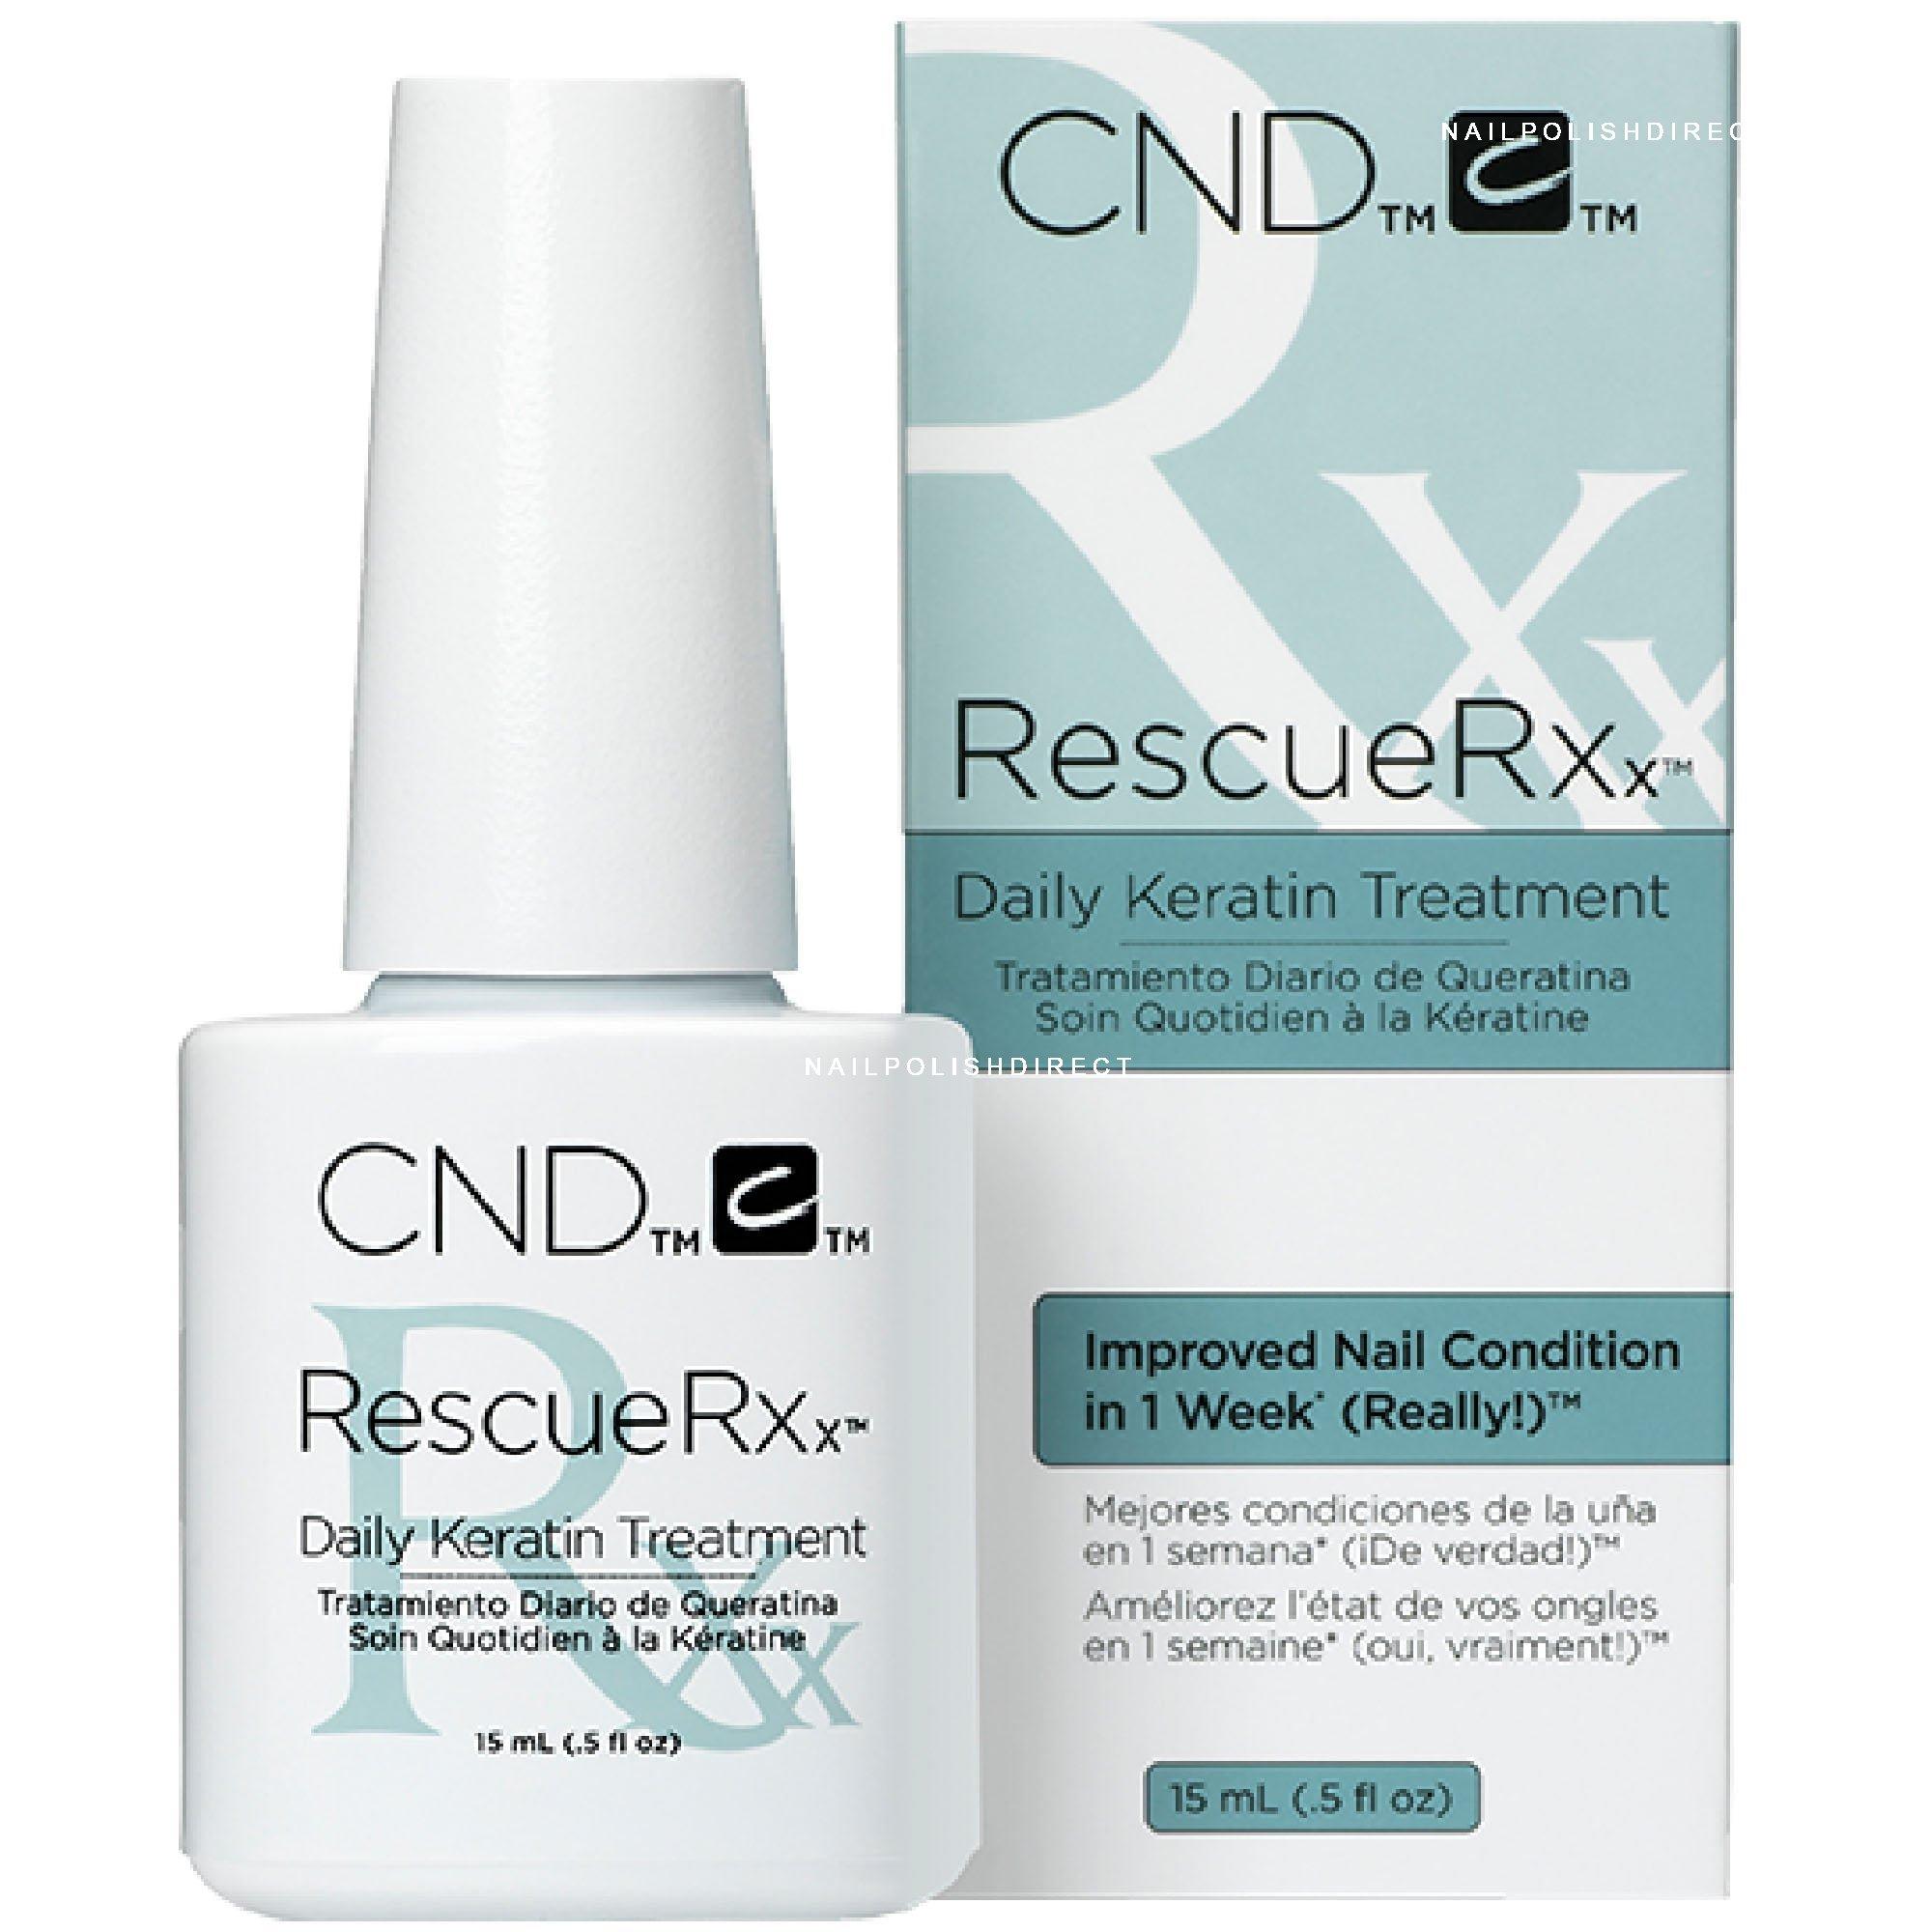 CND Rescue RXx - Daily Keratin Treatment (050) 15ml